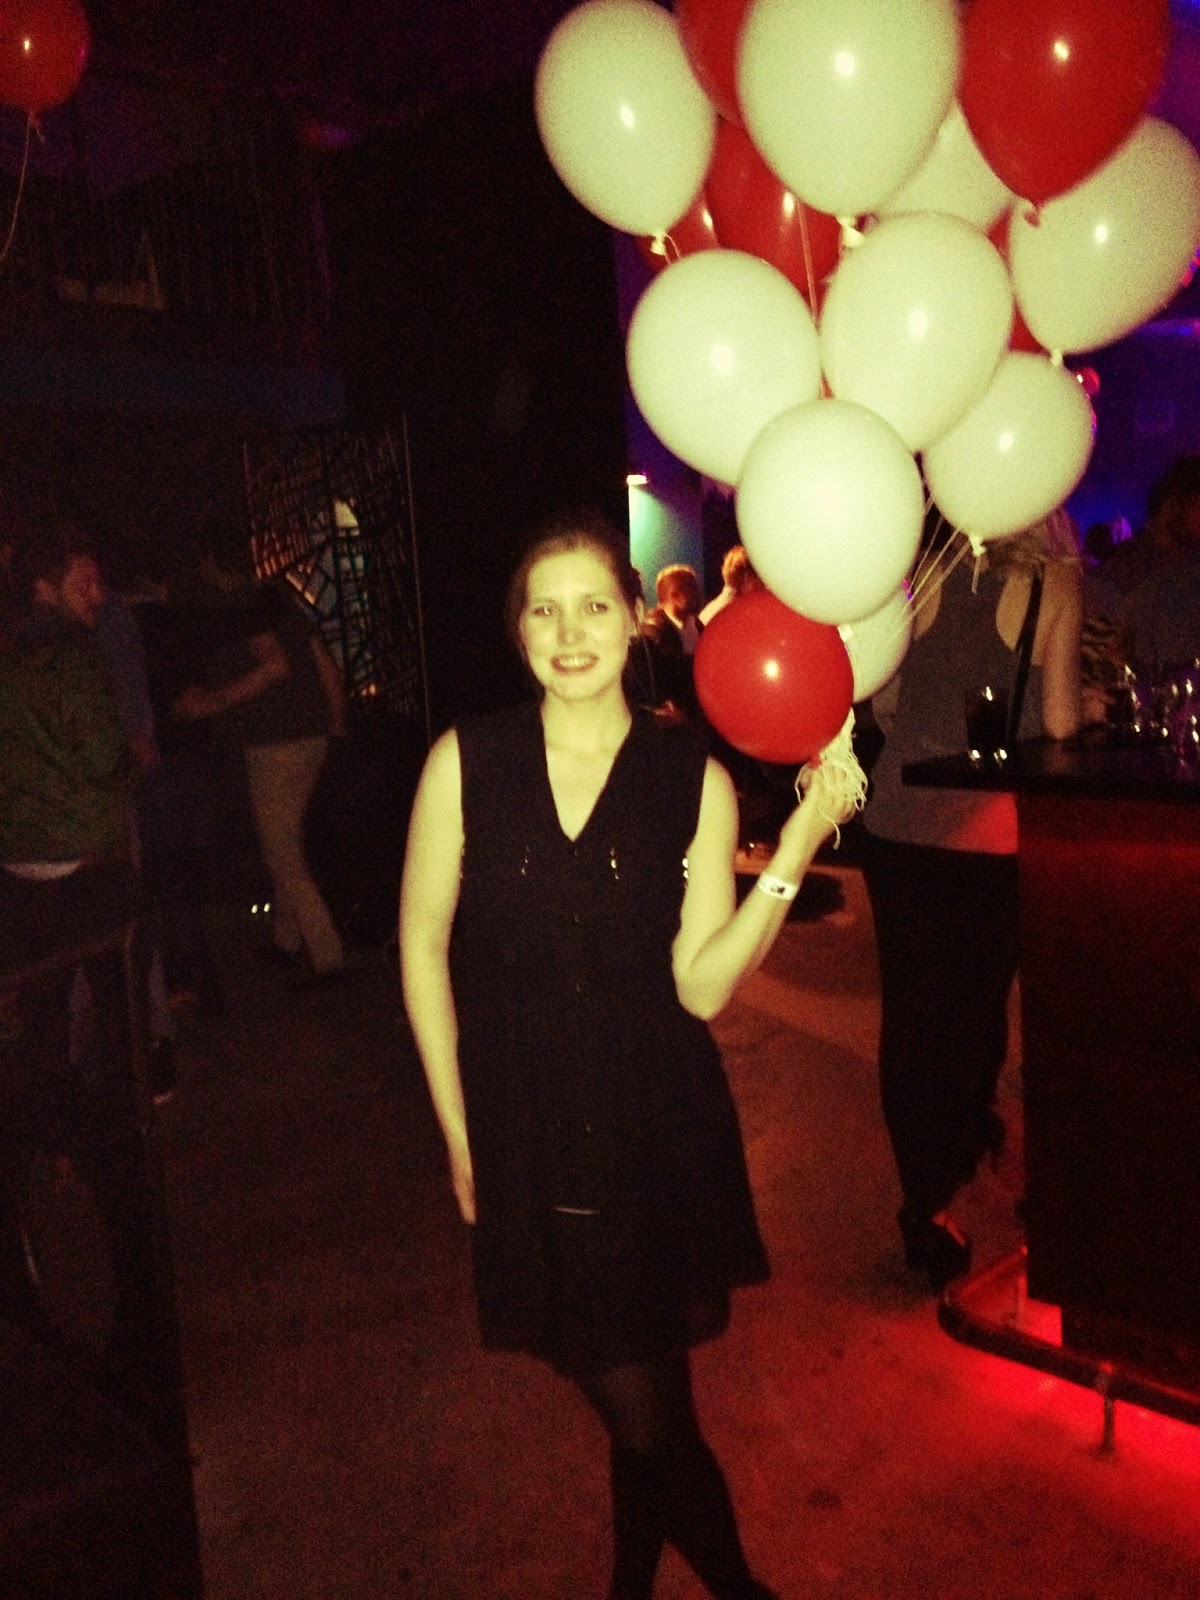 helium, balloner, kb3, mtv, fest, fødselsdag, bytur, party, grin, latter, grineflip, dans, bar, drinks, cocktails, sjov, sommer, kendte, gossip